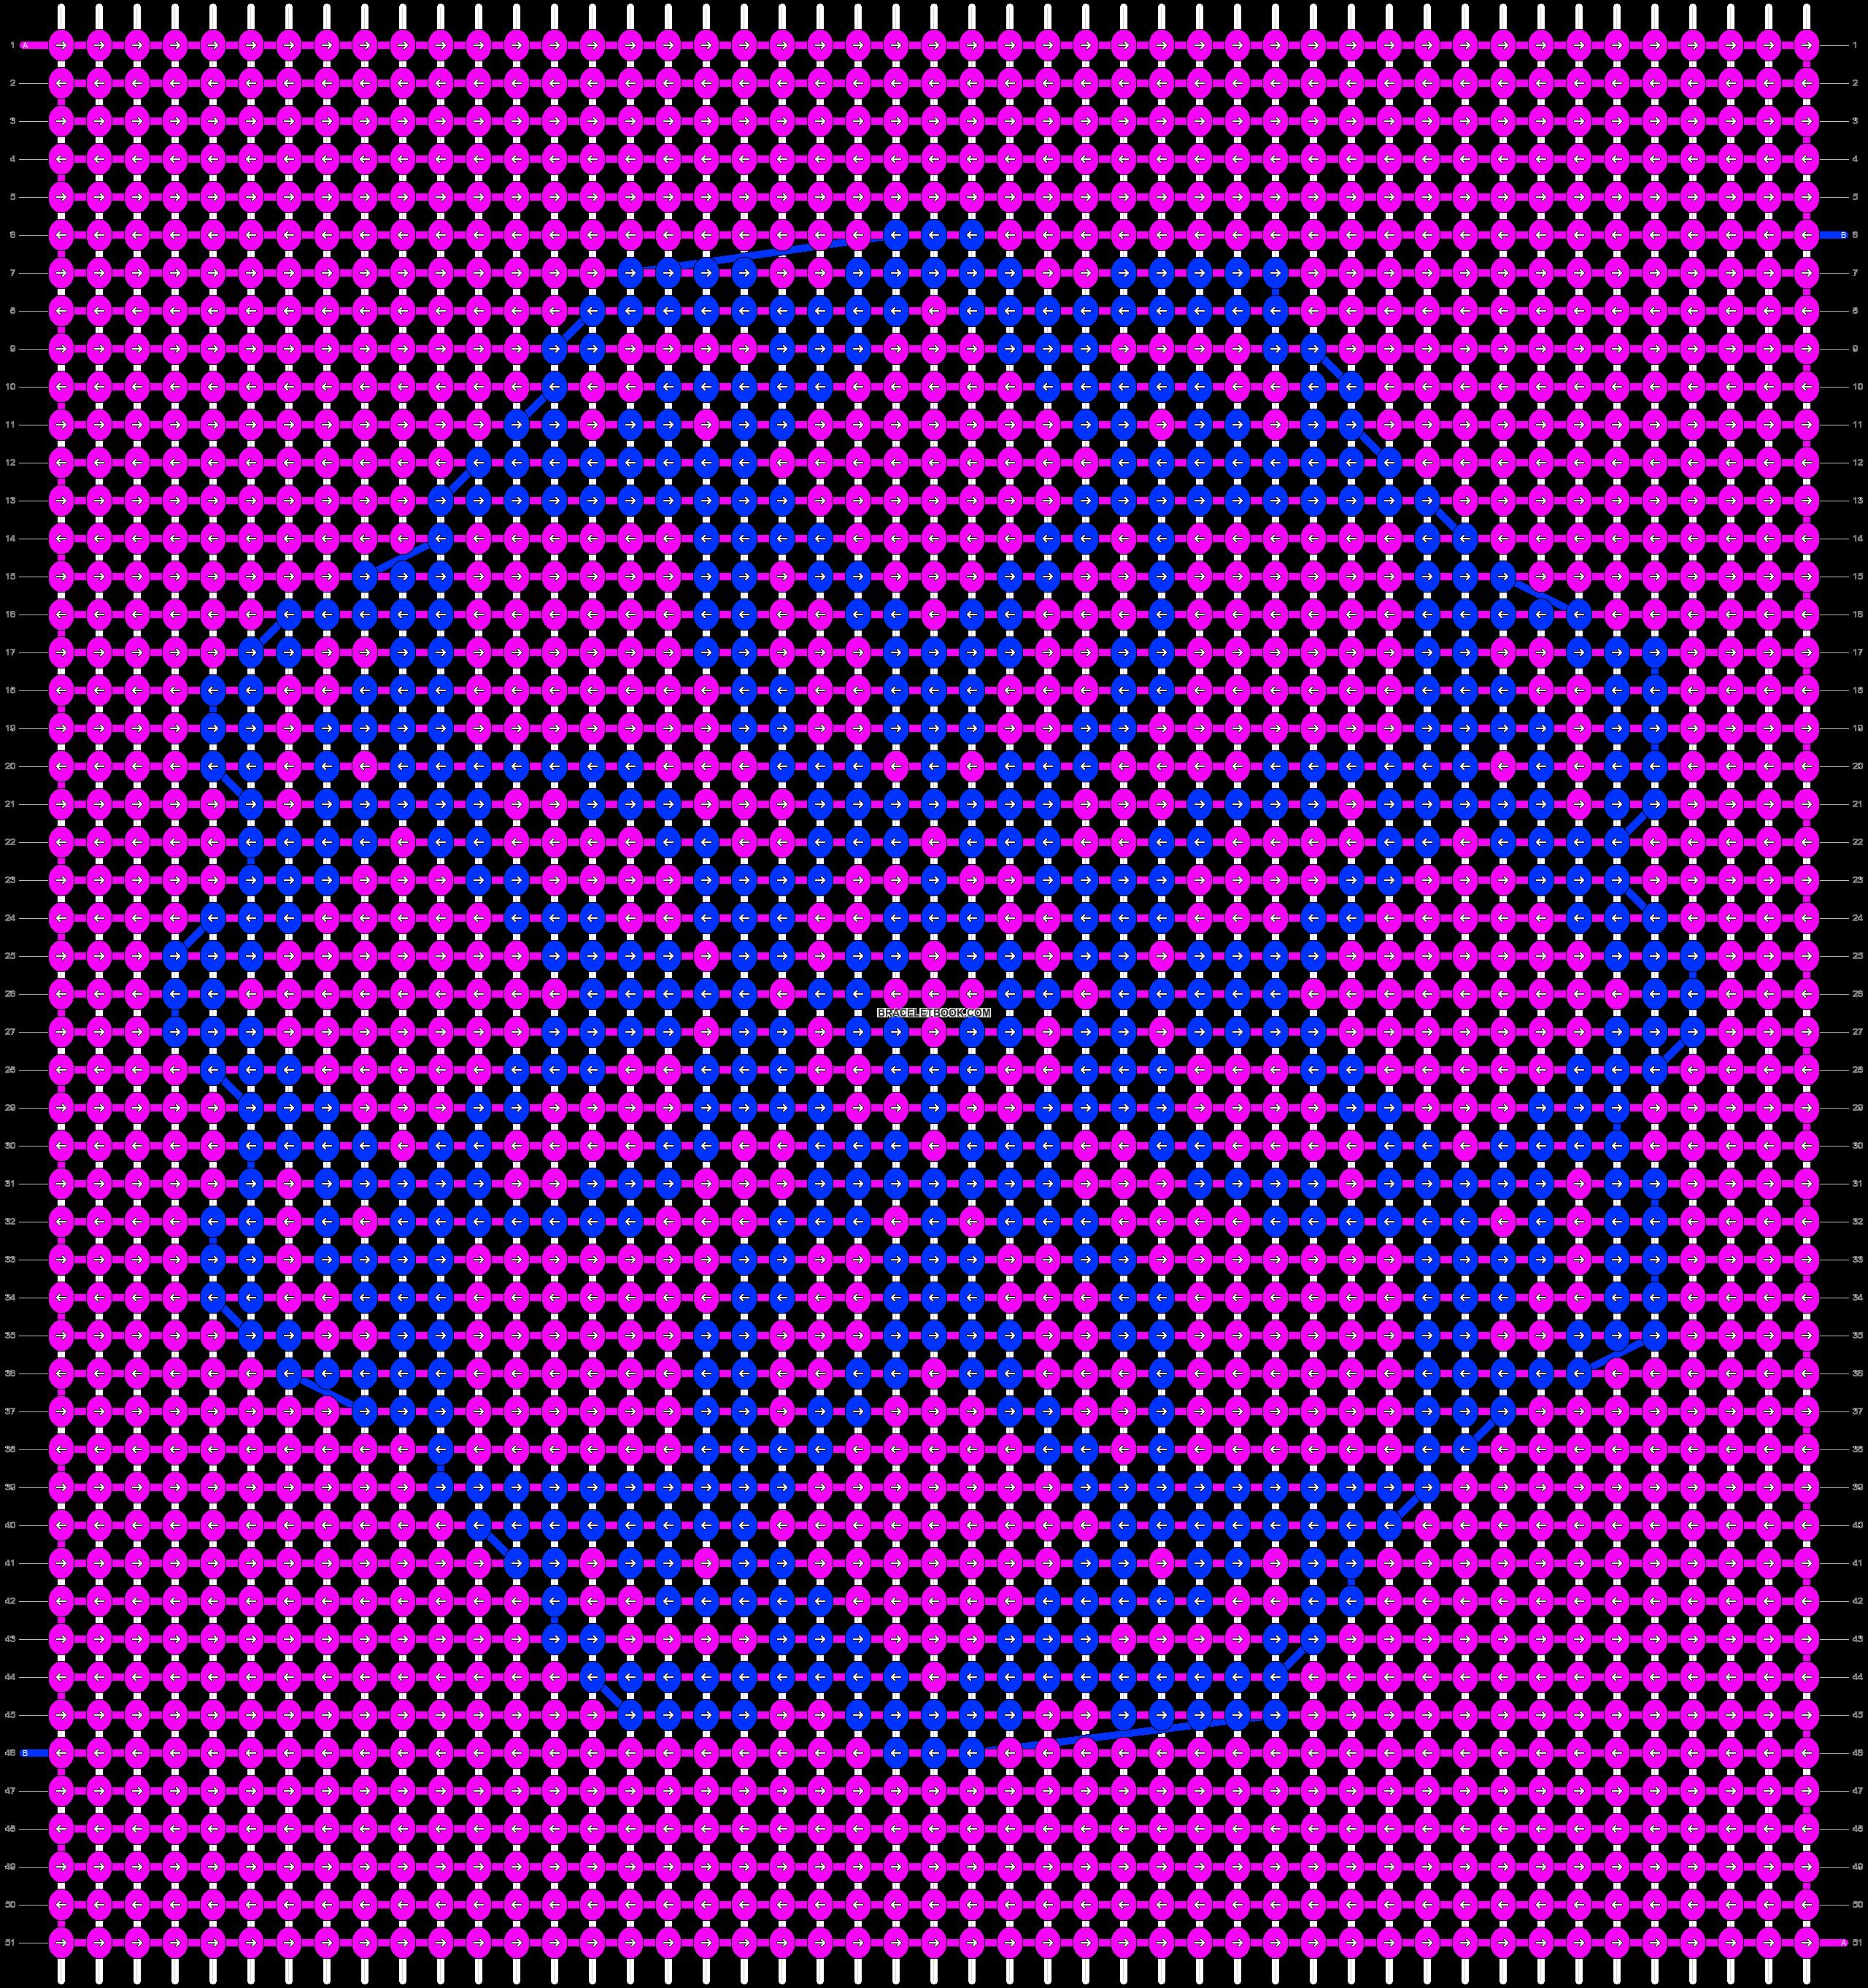 Alpha pattern #27114 pattern